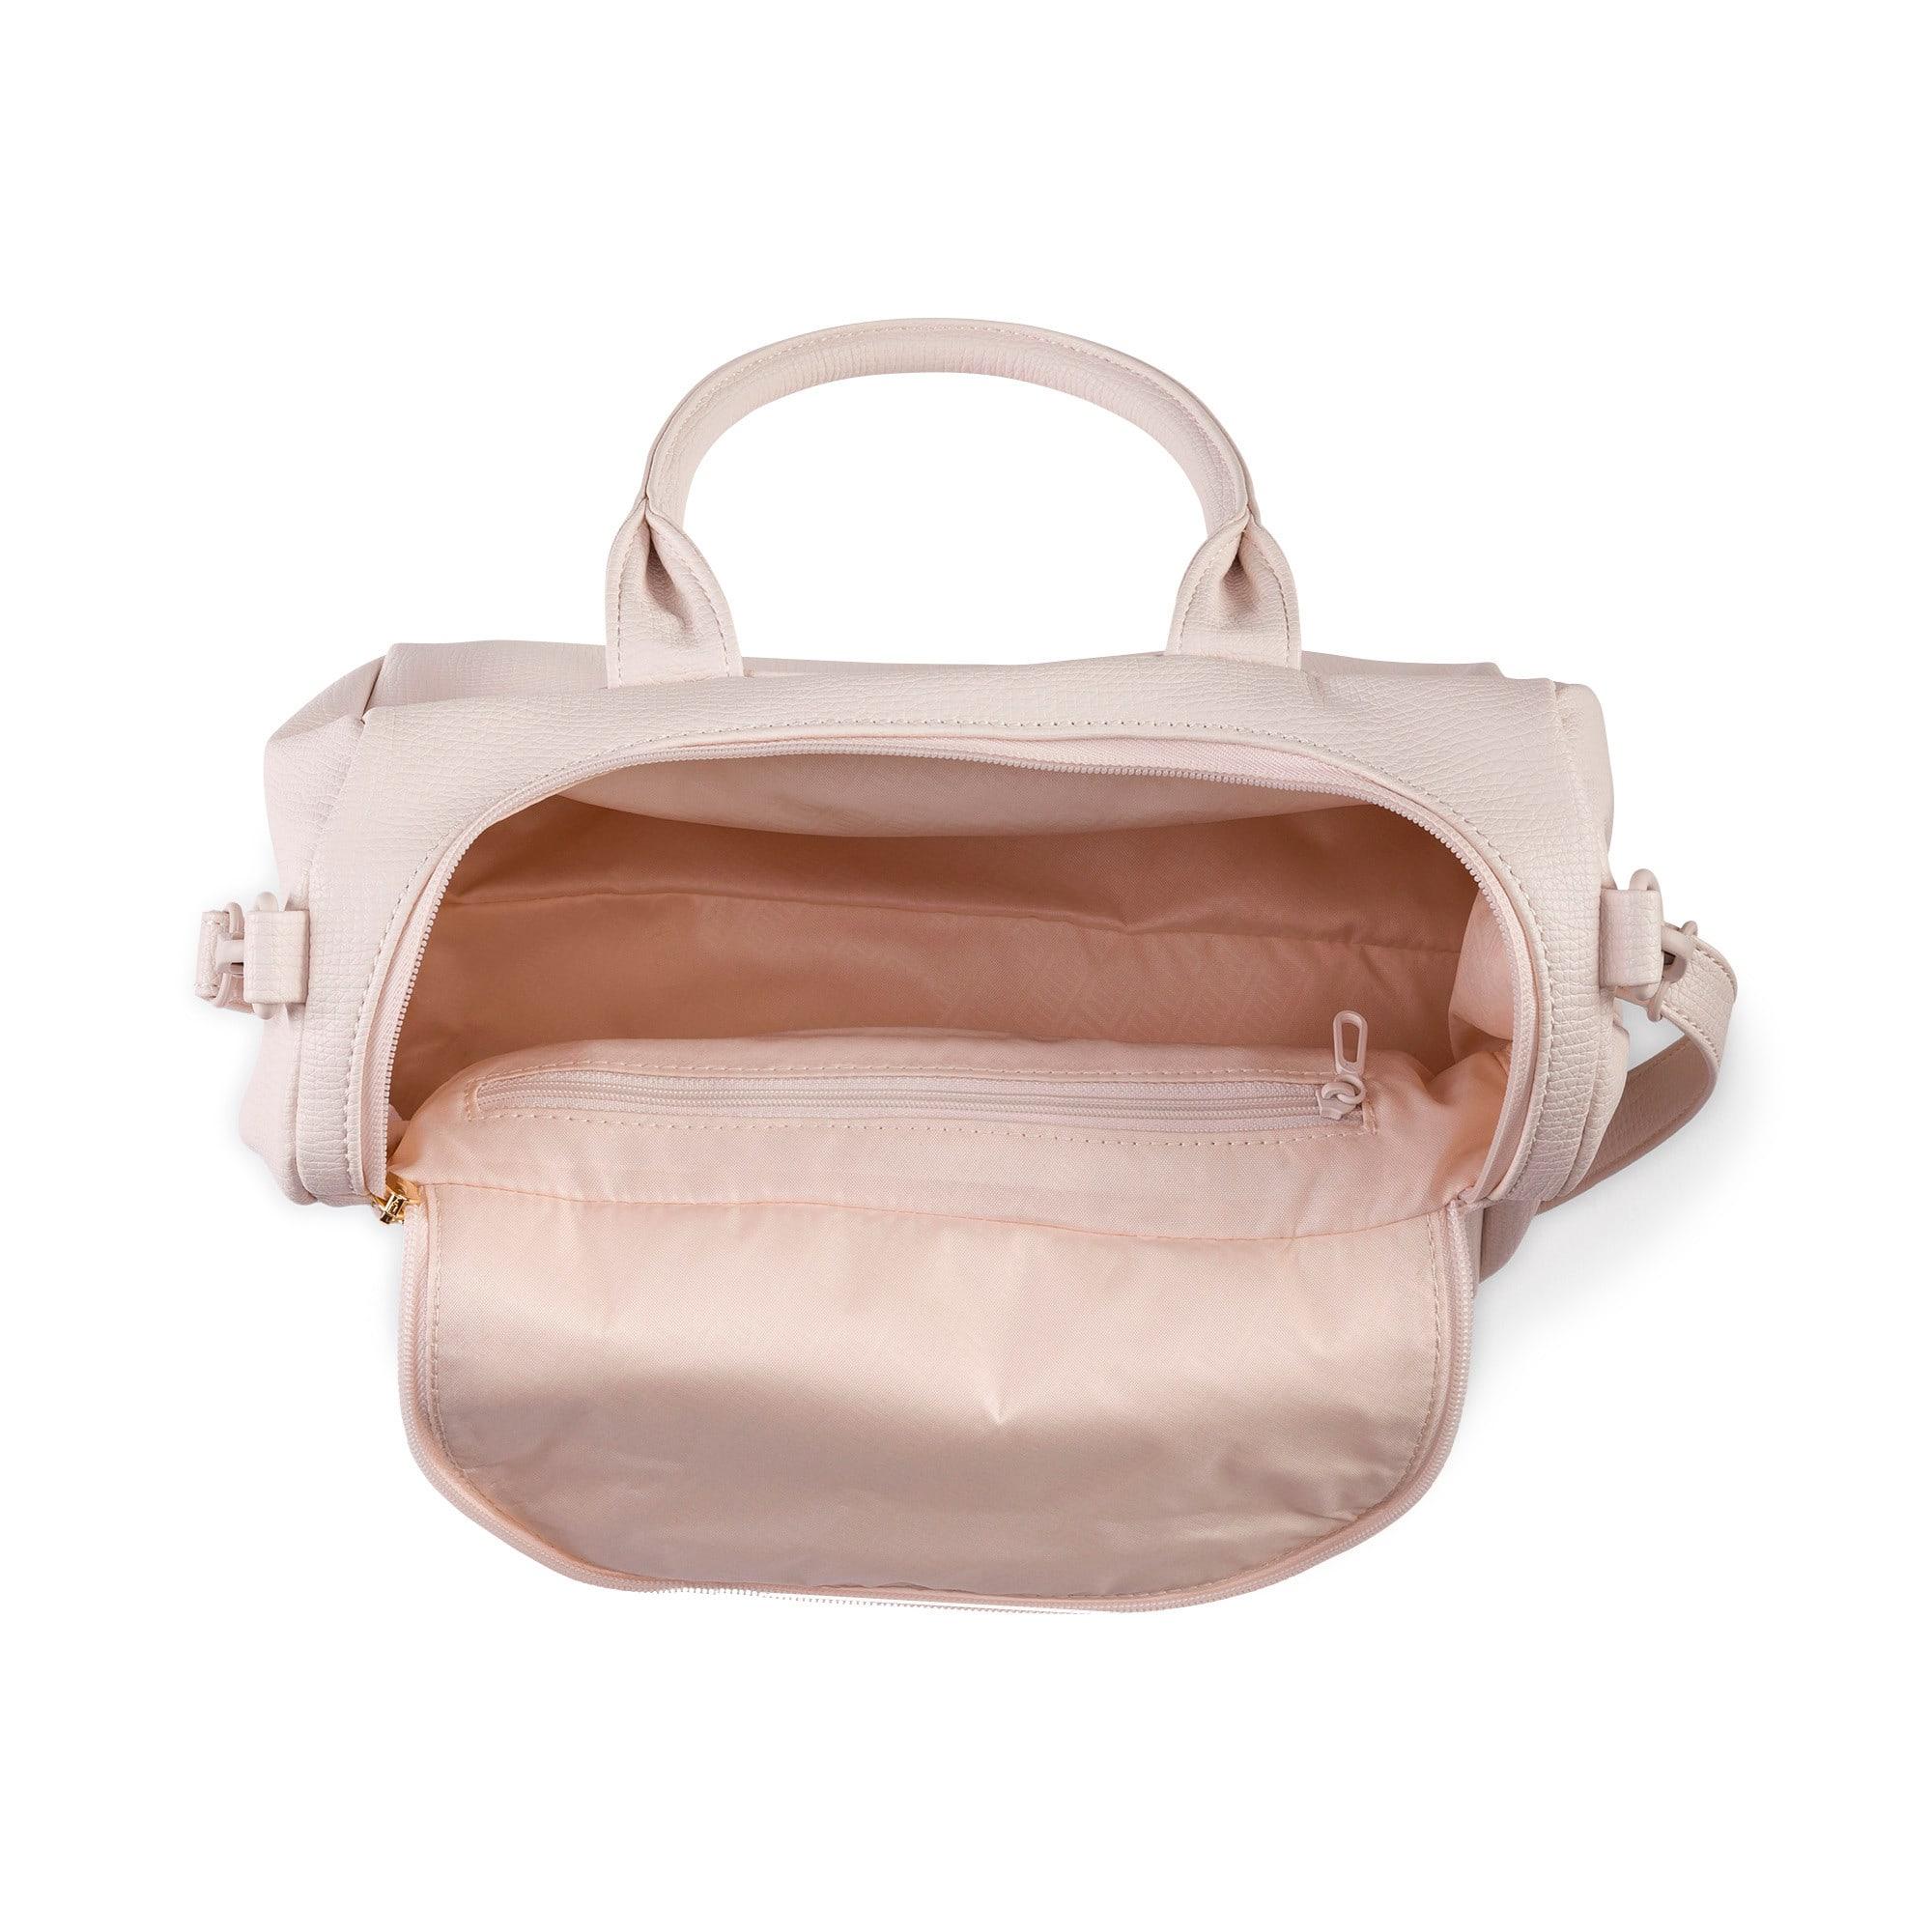 Thumbnail 4 of Ferrari Lifestyle Women's Handbag, Pastel Parchment, medium-IND